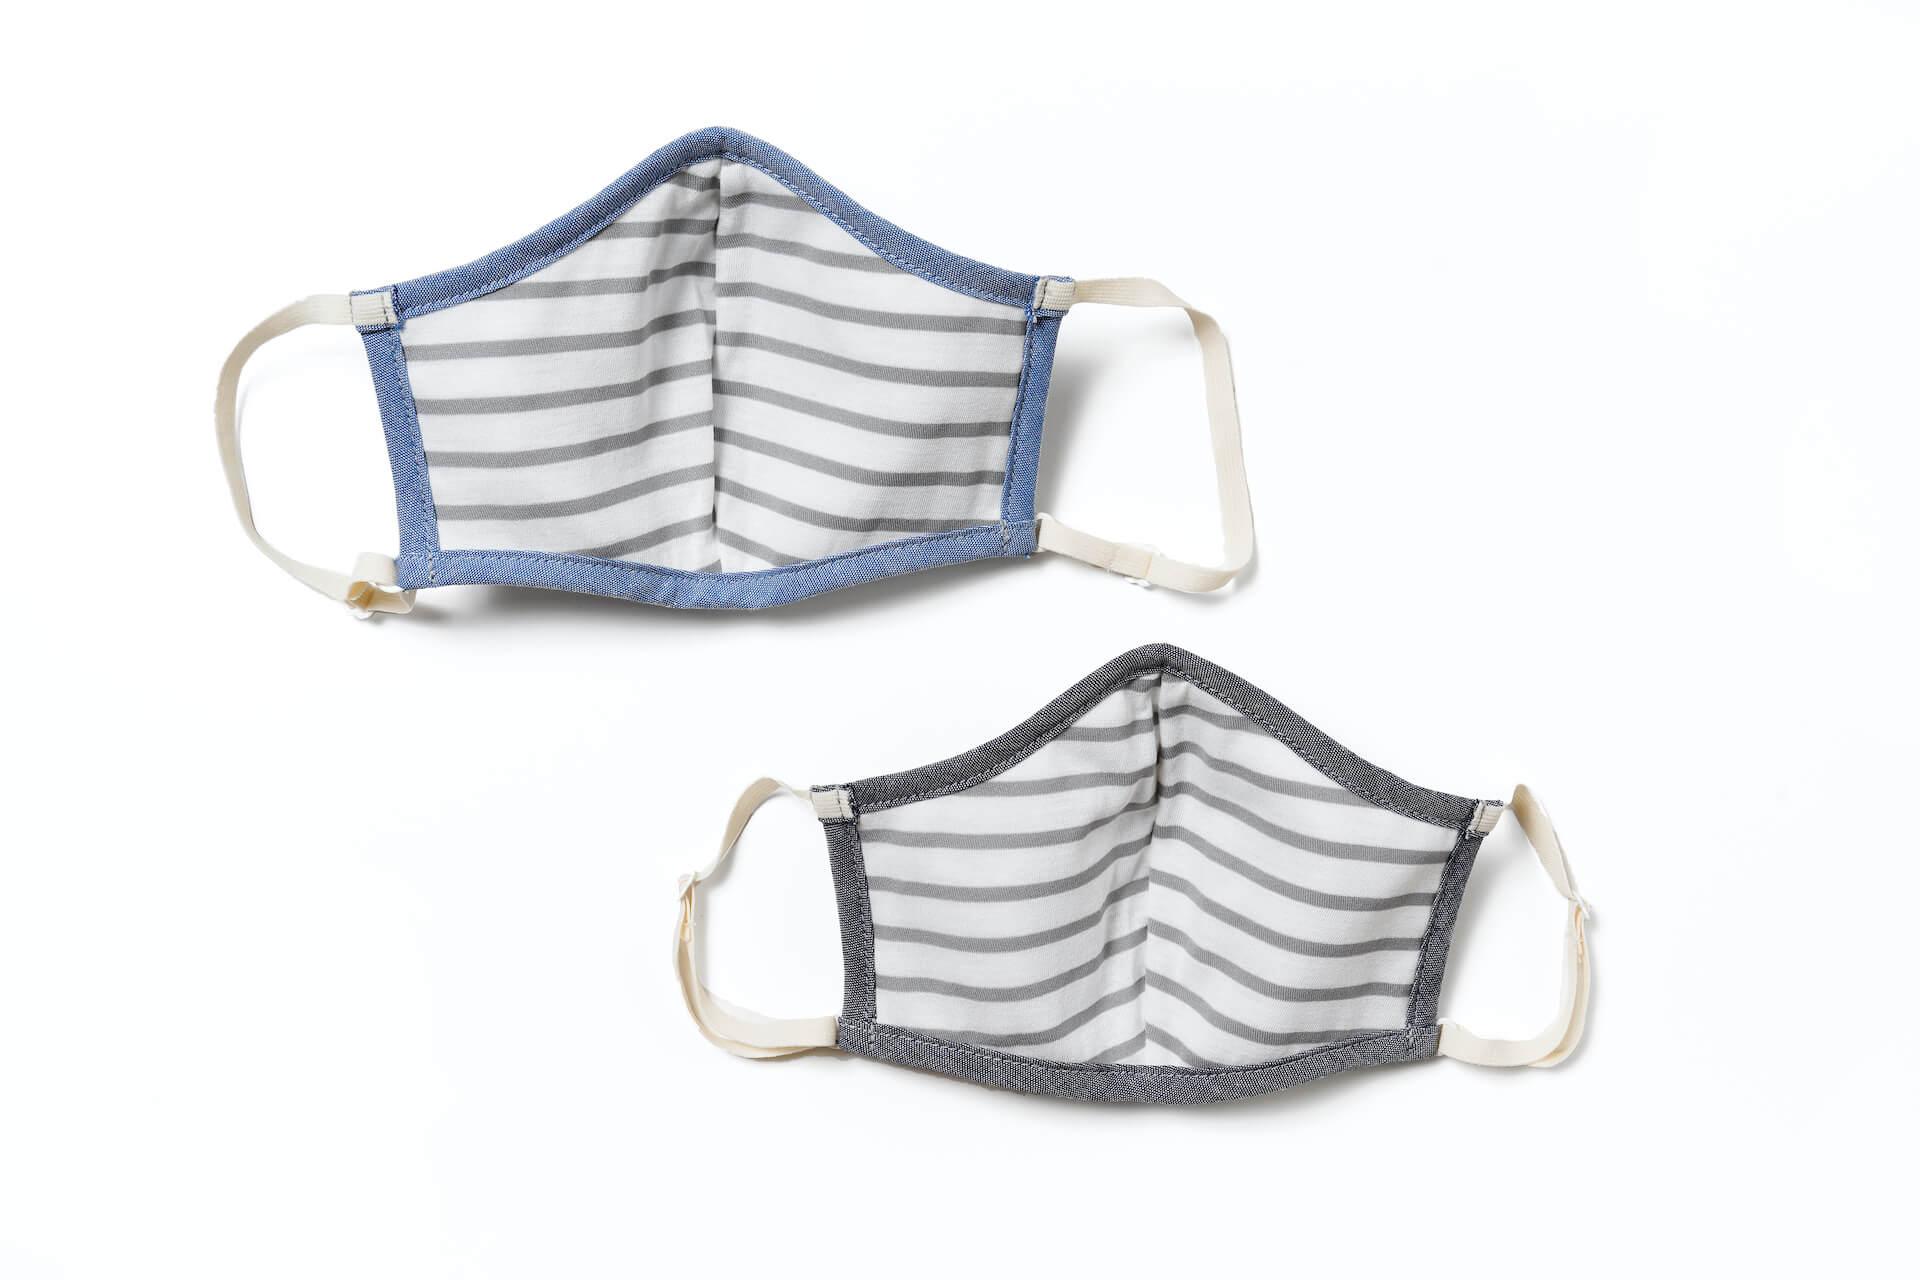 BIG JOHNから、ひんやり冷感素材の『Washable Cool Mask』が登場!予約販売も開始 lf200526_bigjohnmask_04